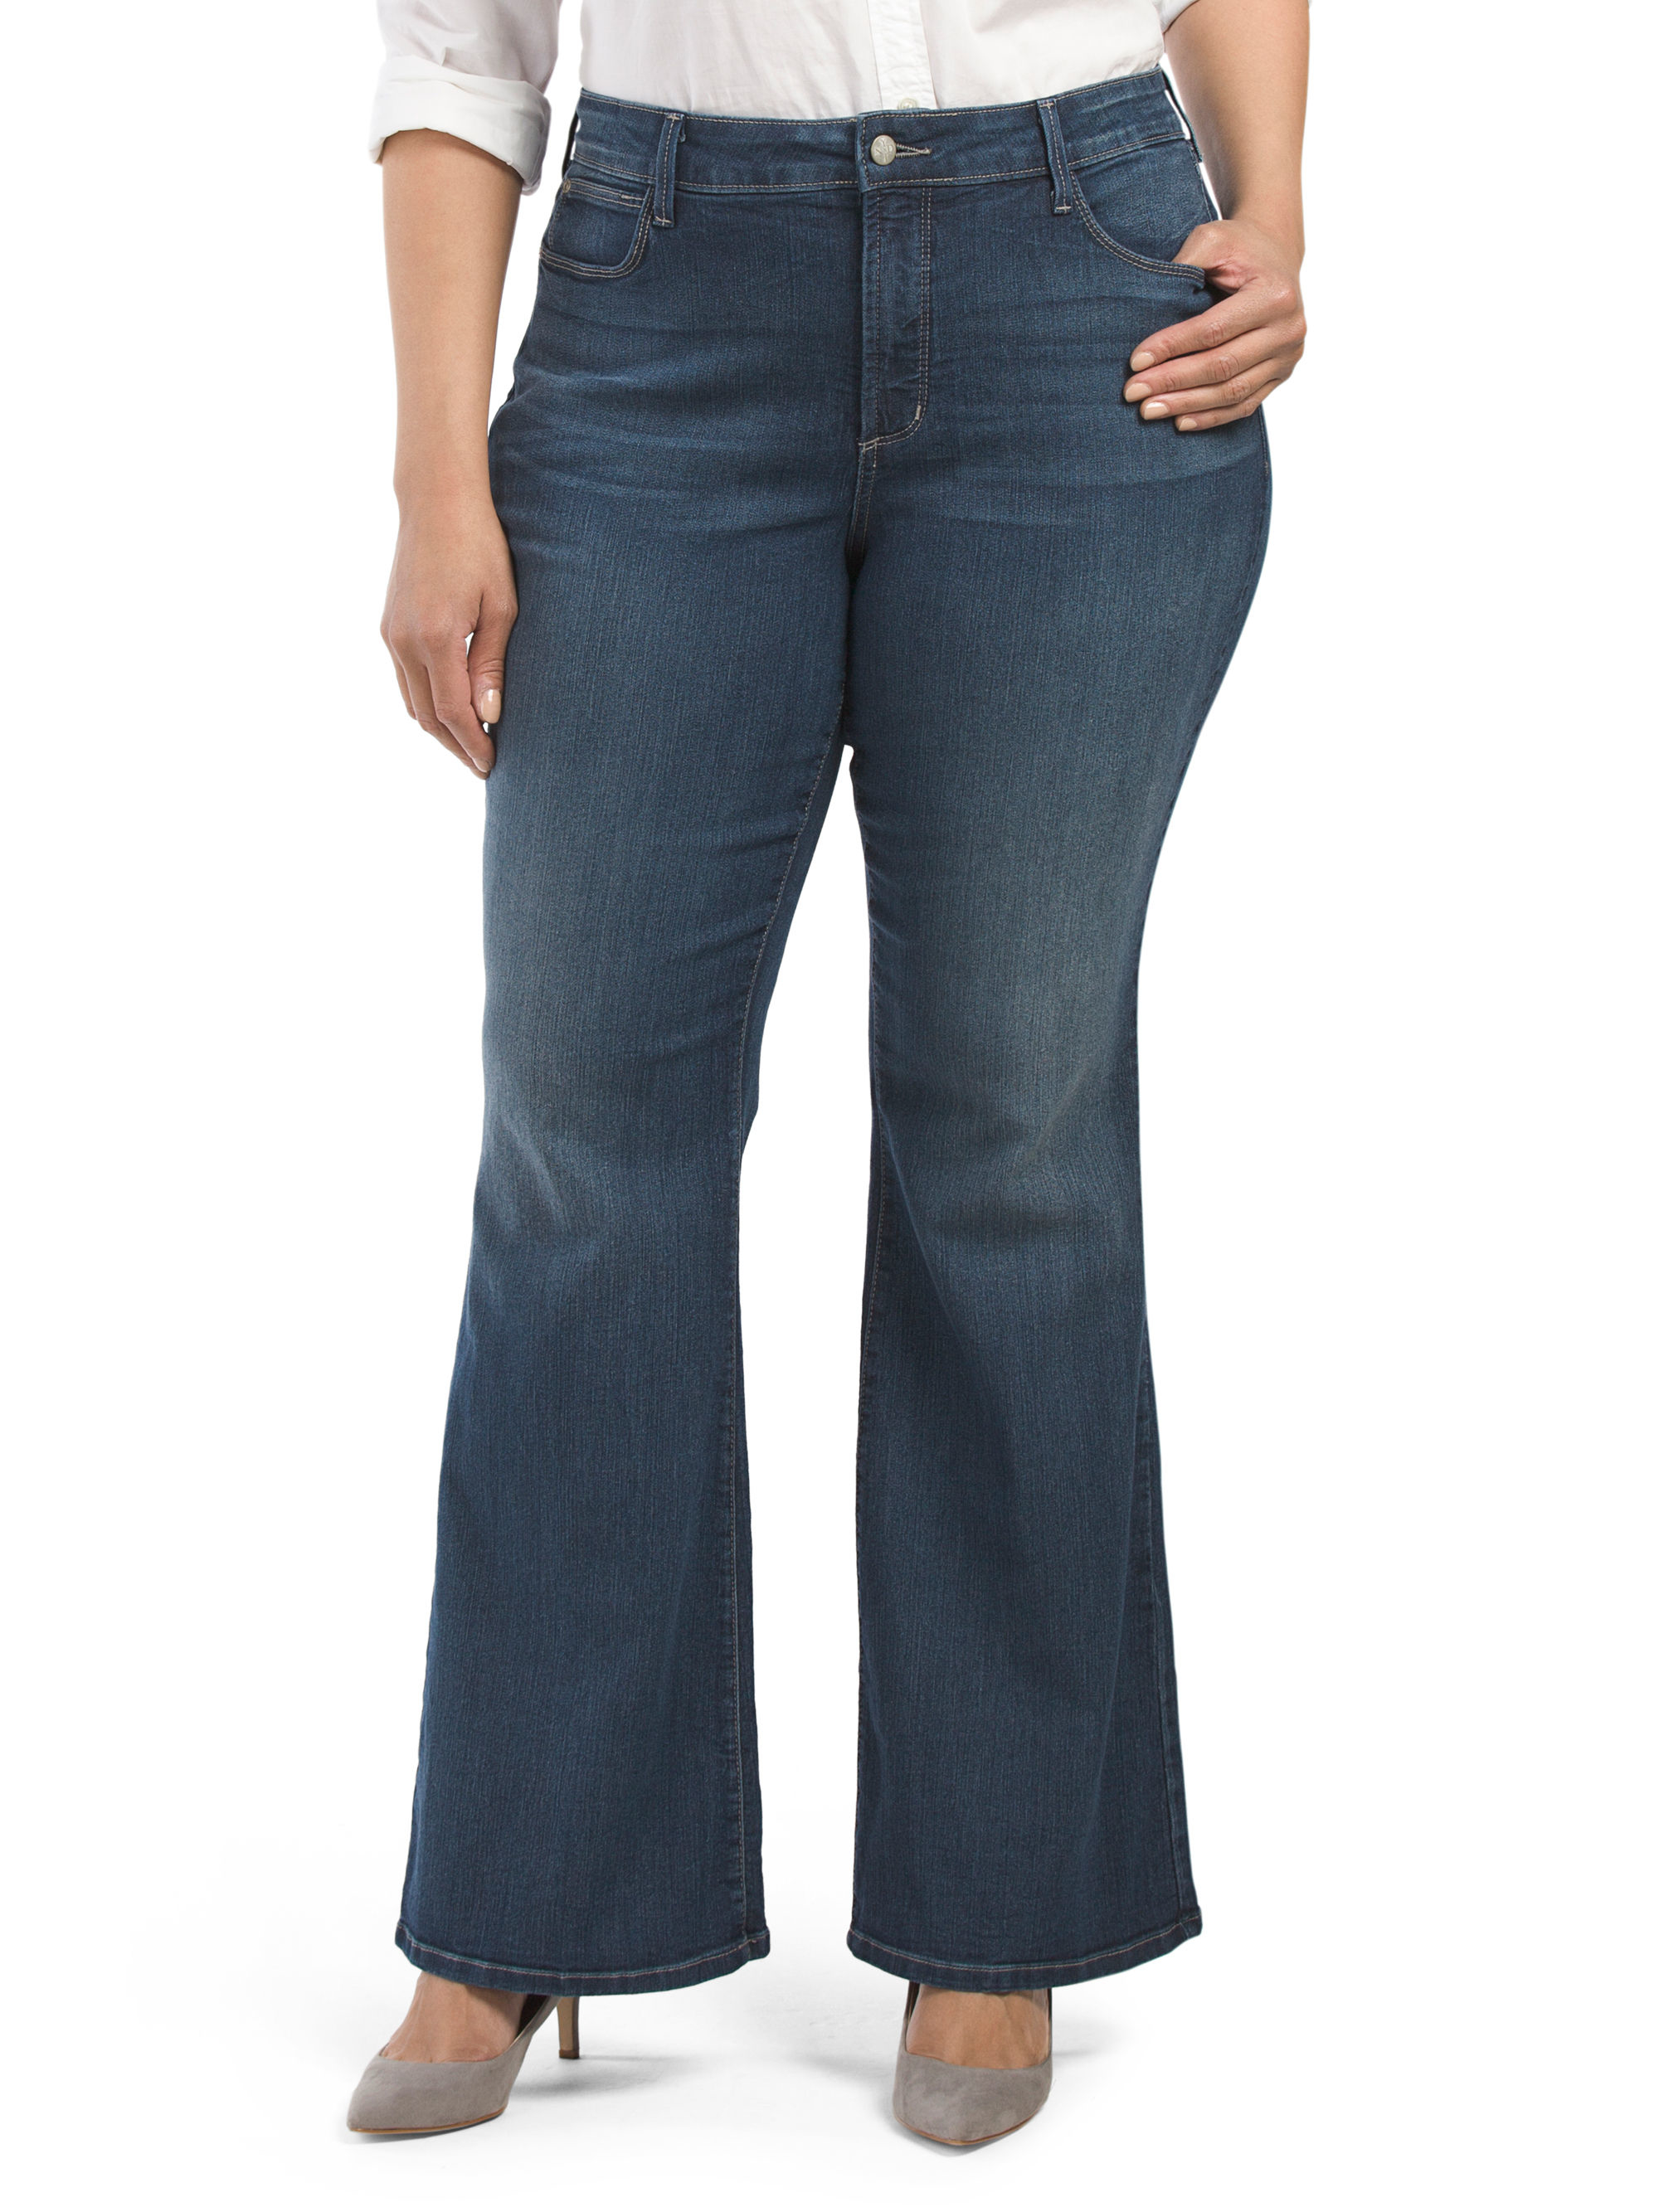 Tj maxx plus made in usa farrah flare jean in blue lyst for Tj maxx t shirts